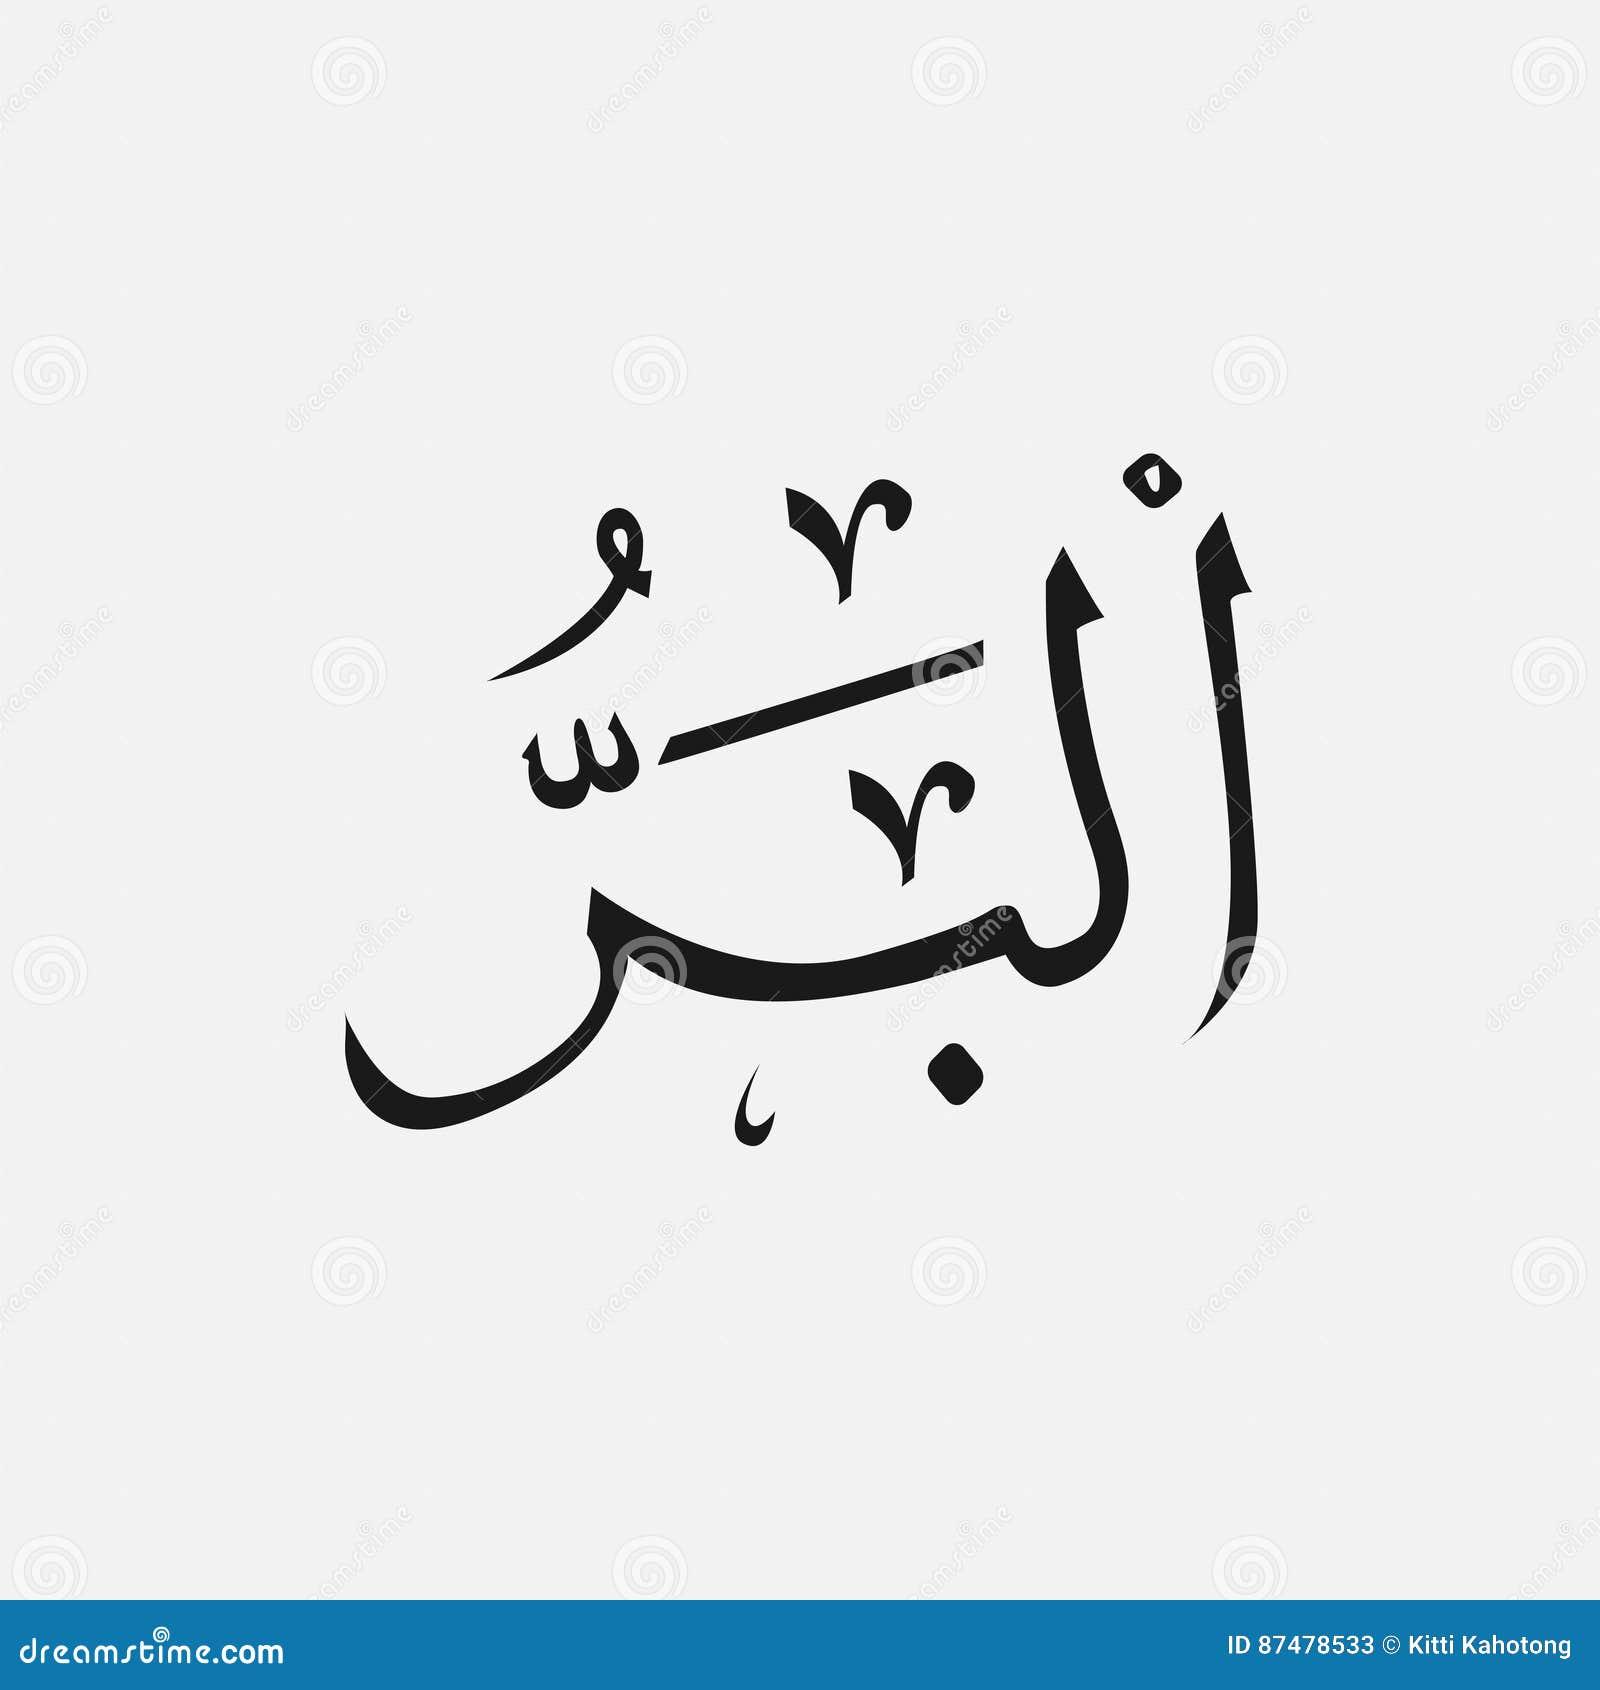 Name of god islam allah in arabic writing